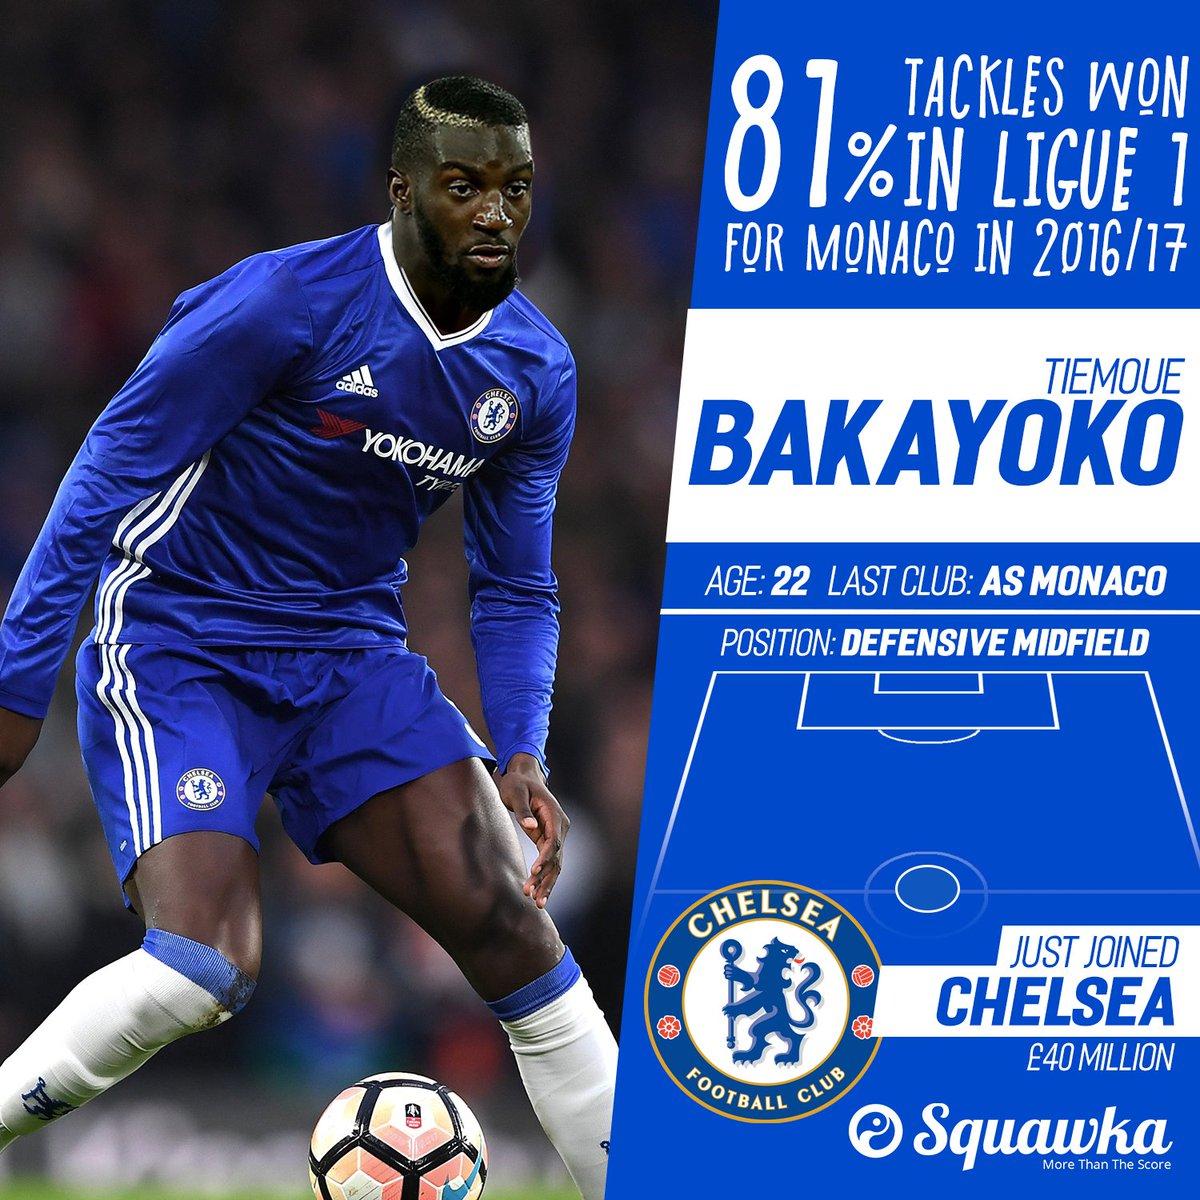 BREAKING Chelsea Signs Tiemoue Bakayoko From Monaco For £40 million